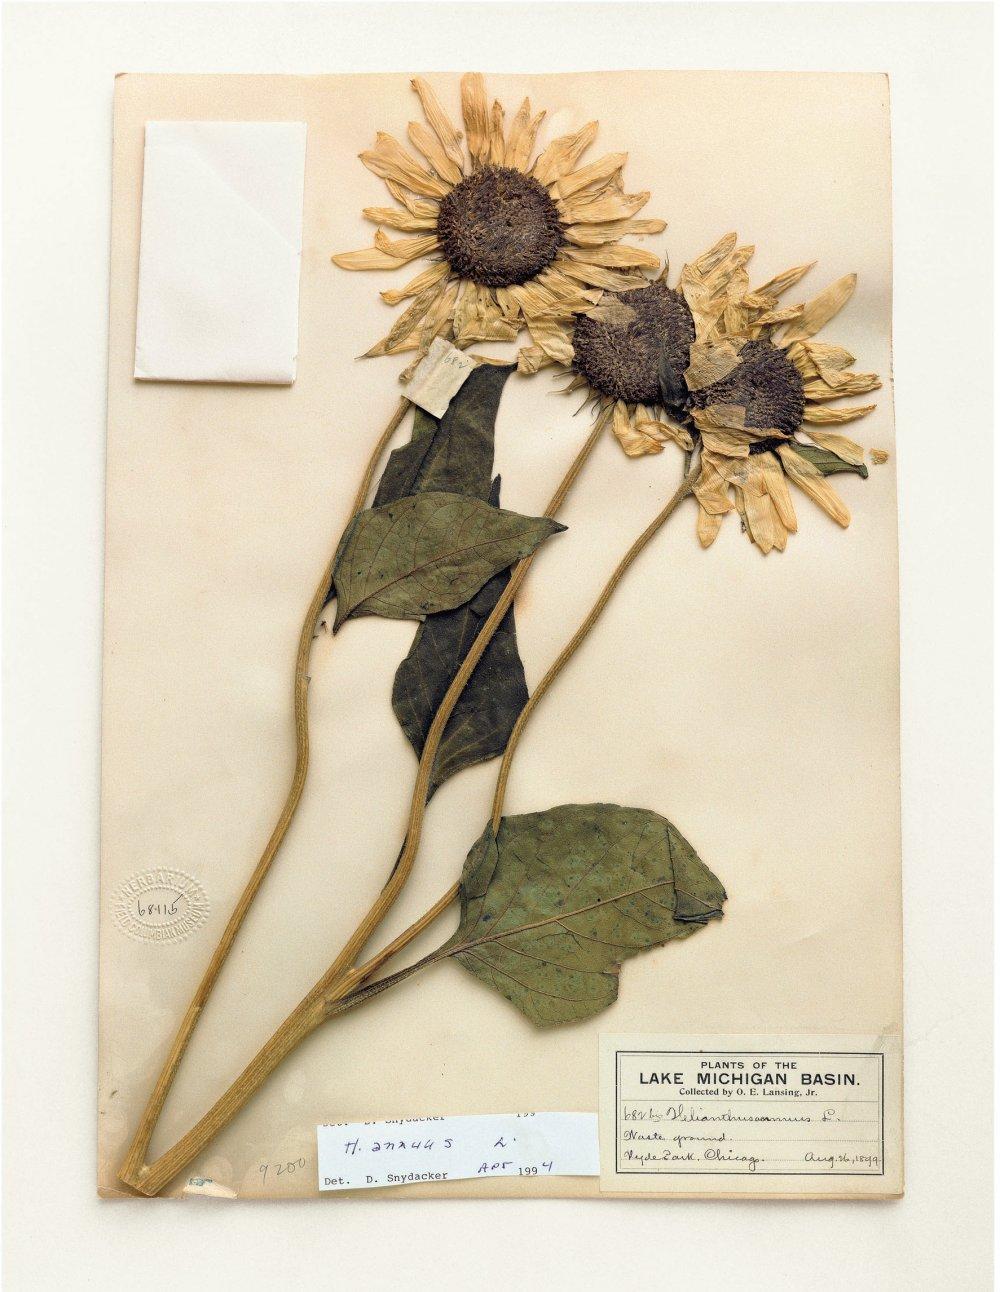 Field Museum, Helianthus Annuus, 1899